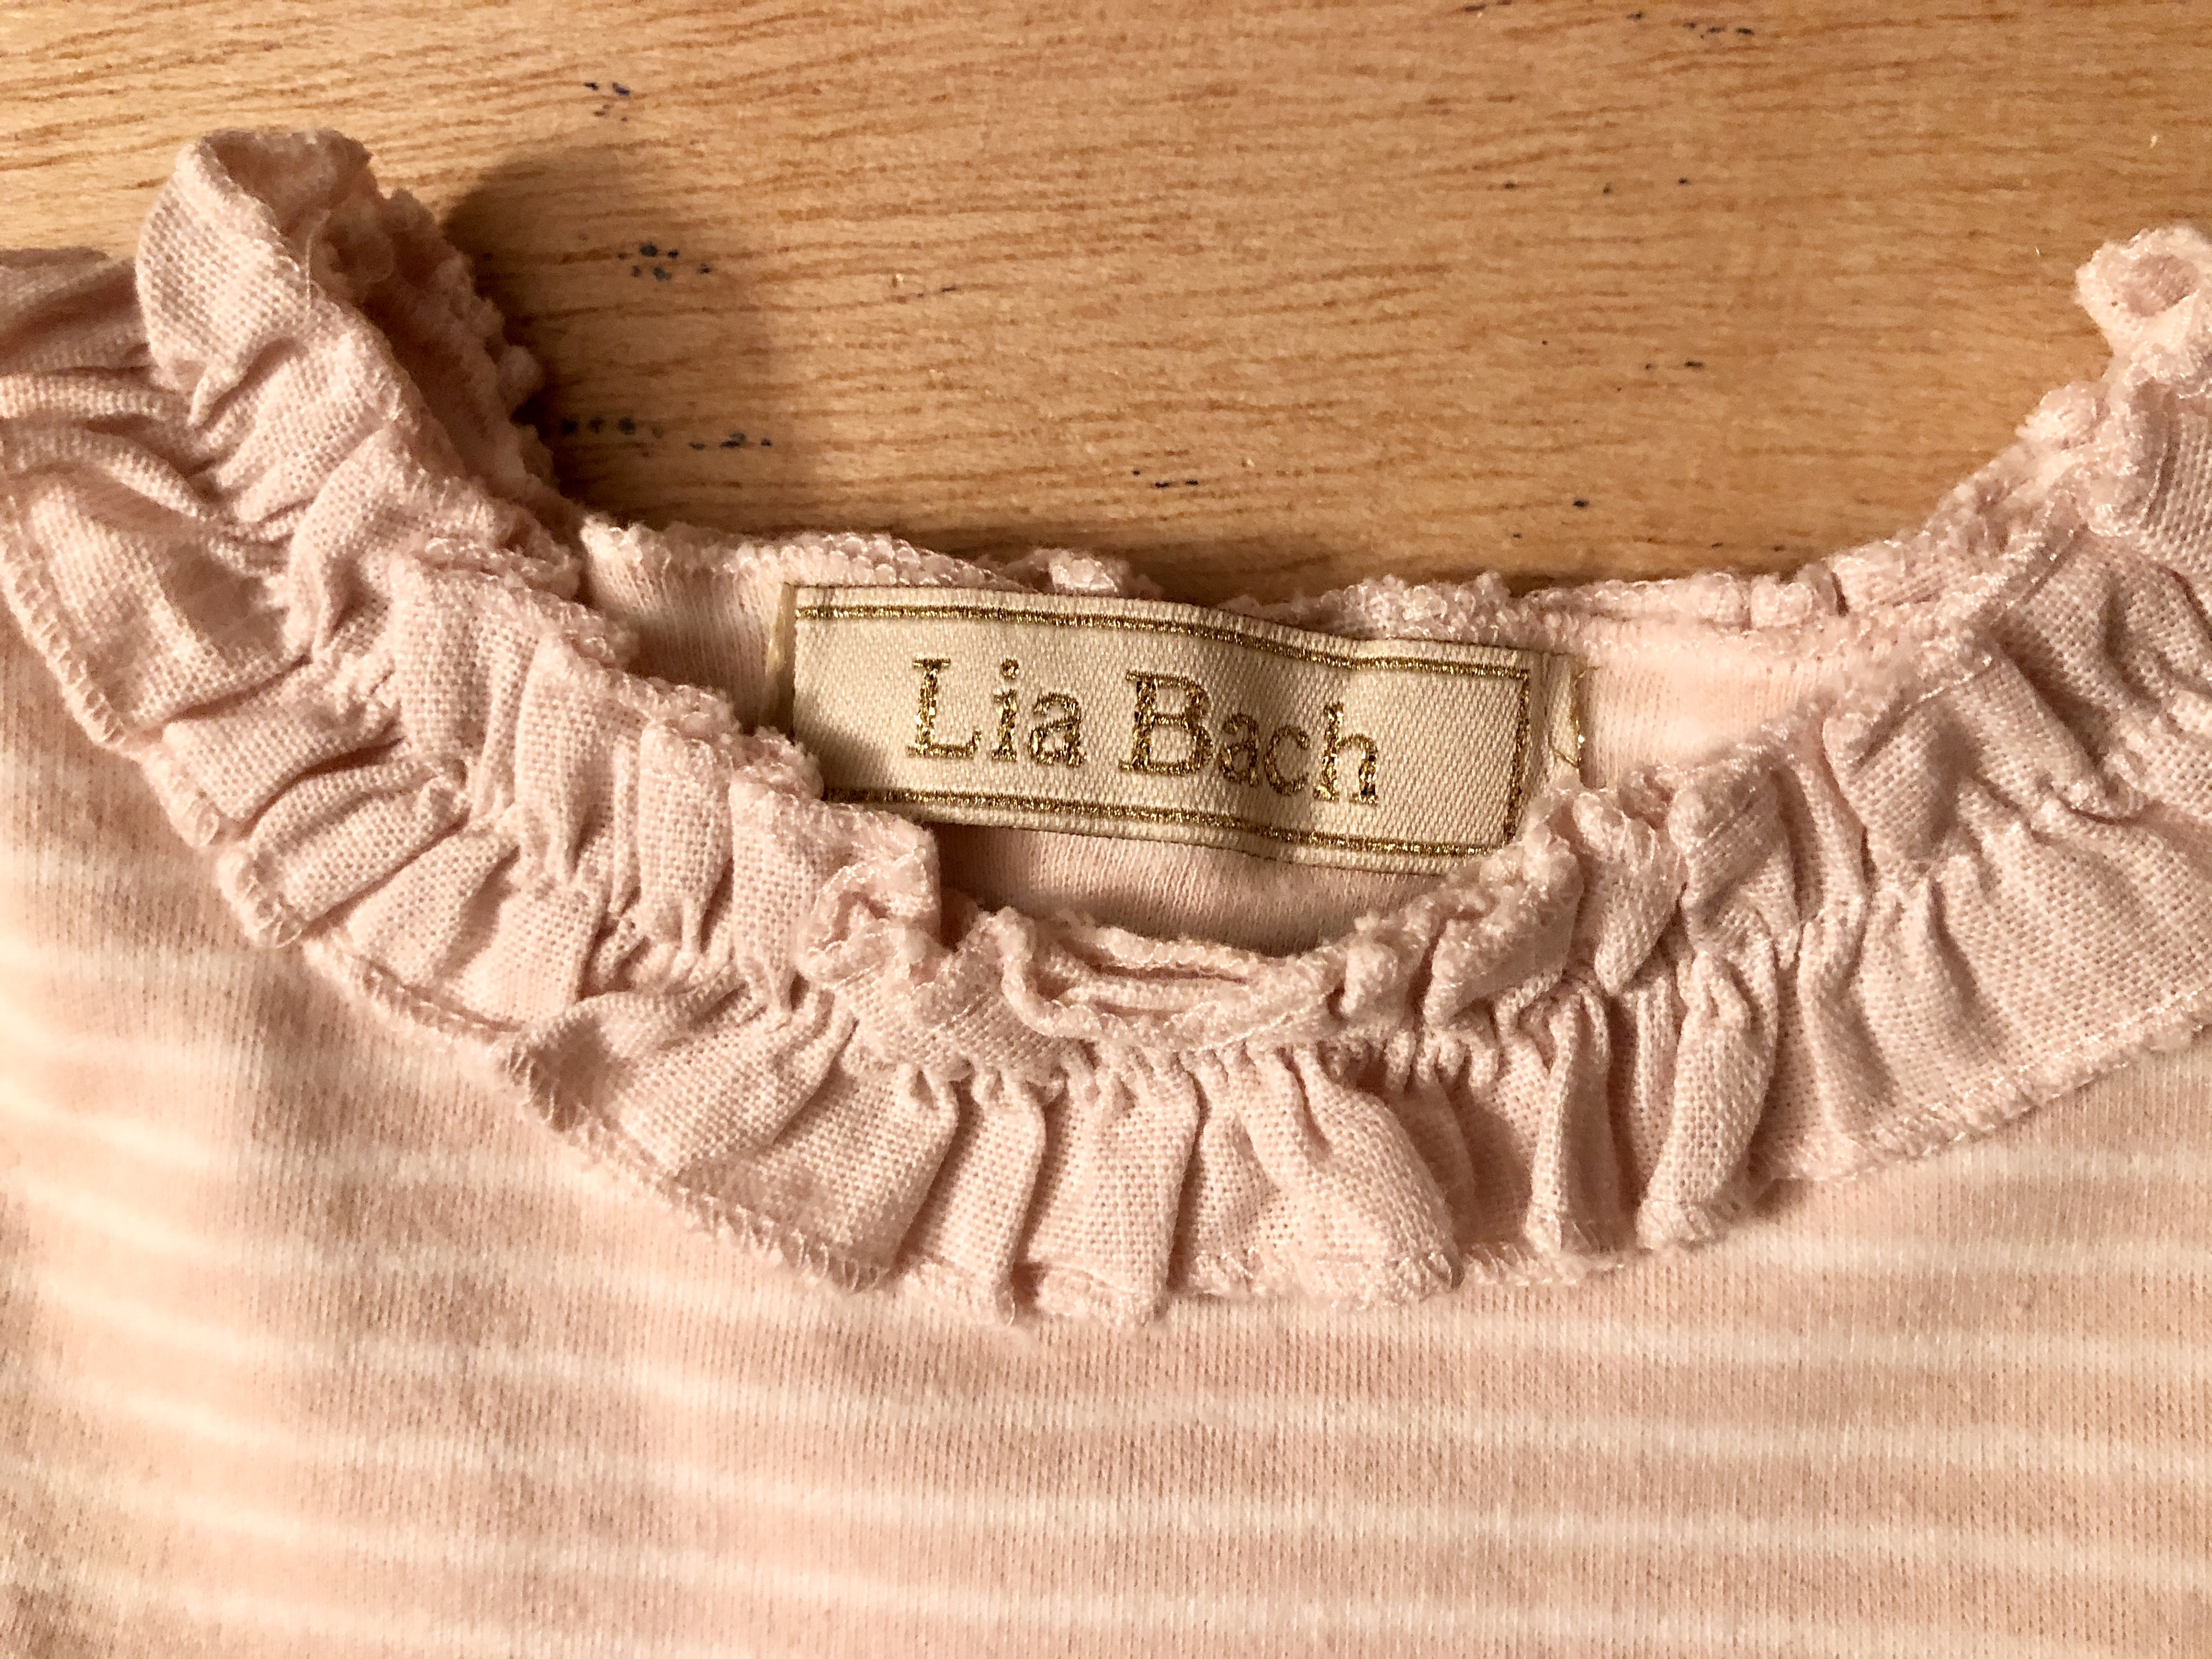 Gr. 92 Lia Bach Dirndl - Bio Baumwolle Made in Germany